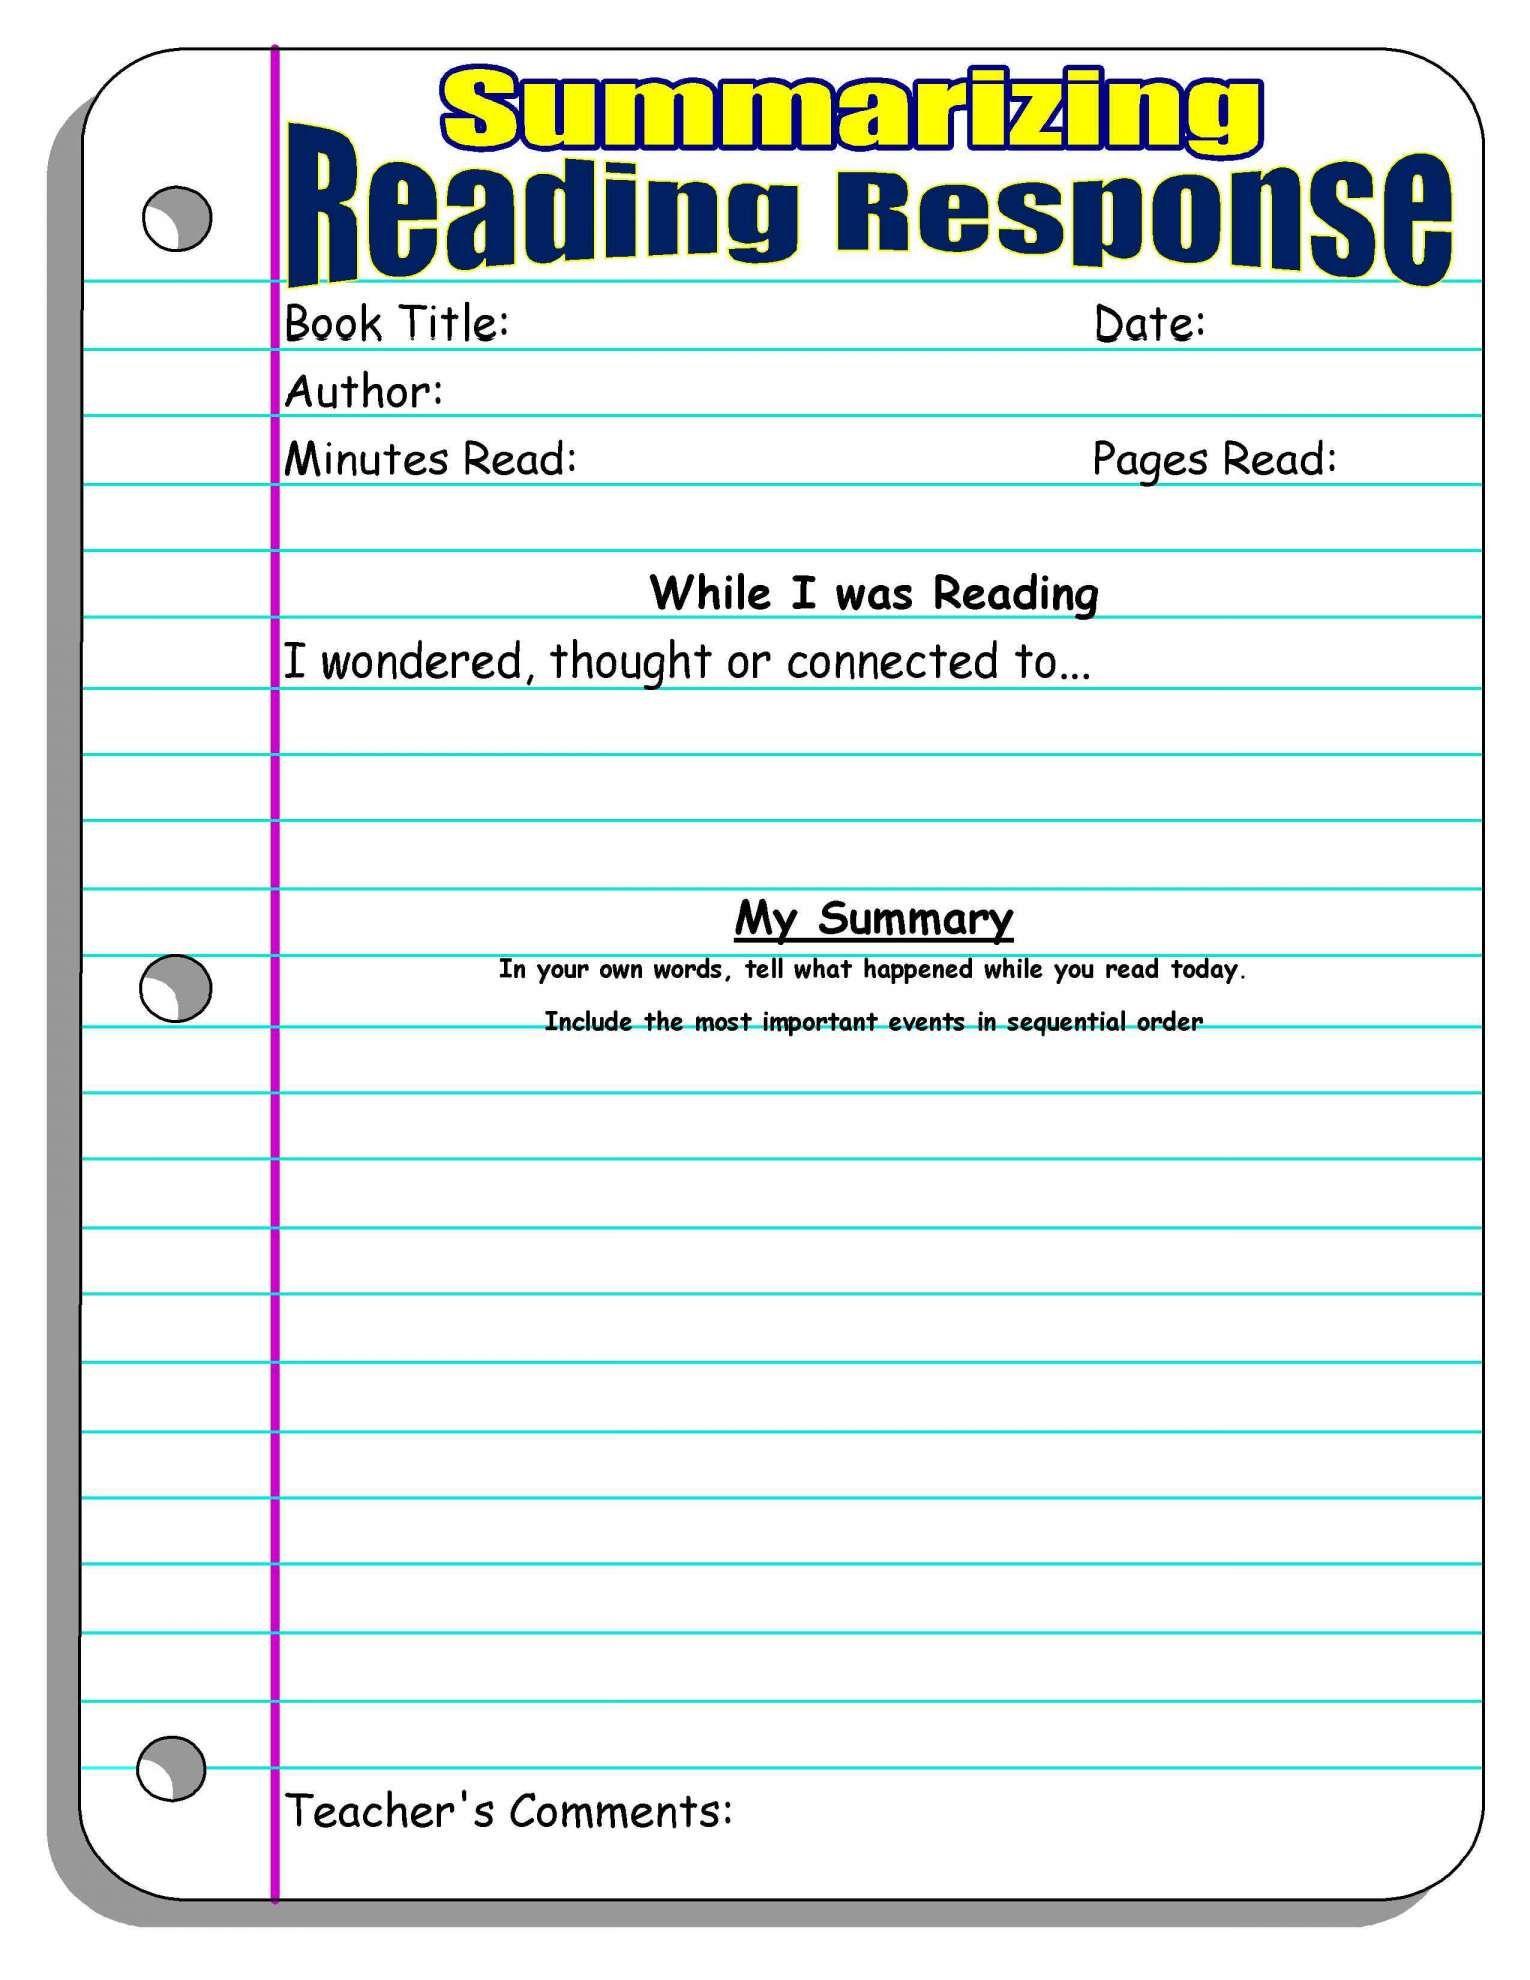 12 5th Grade Reading Response Worksheet Check More At Https Printable Sheets Com 12 5th Grade Reading Response Reading Response Worksheets Read To Self [ 1980 x 1530 Pixel ]